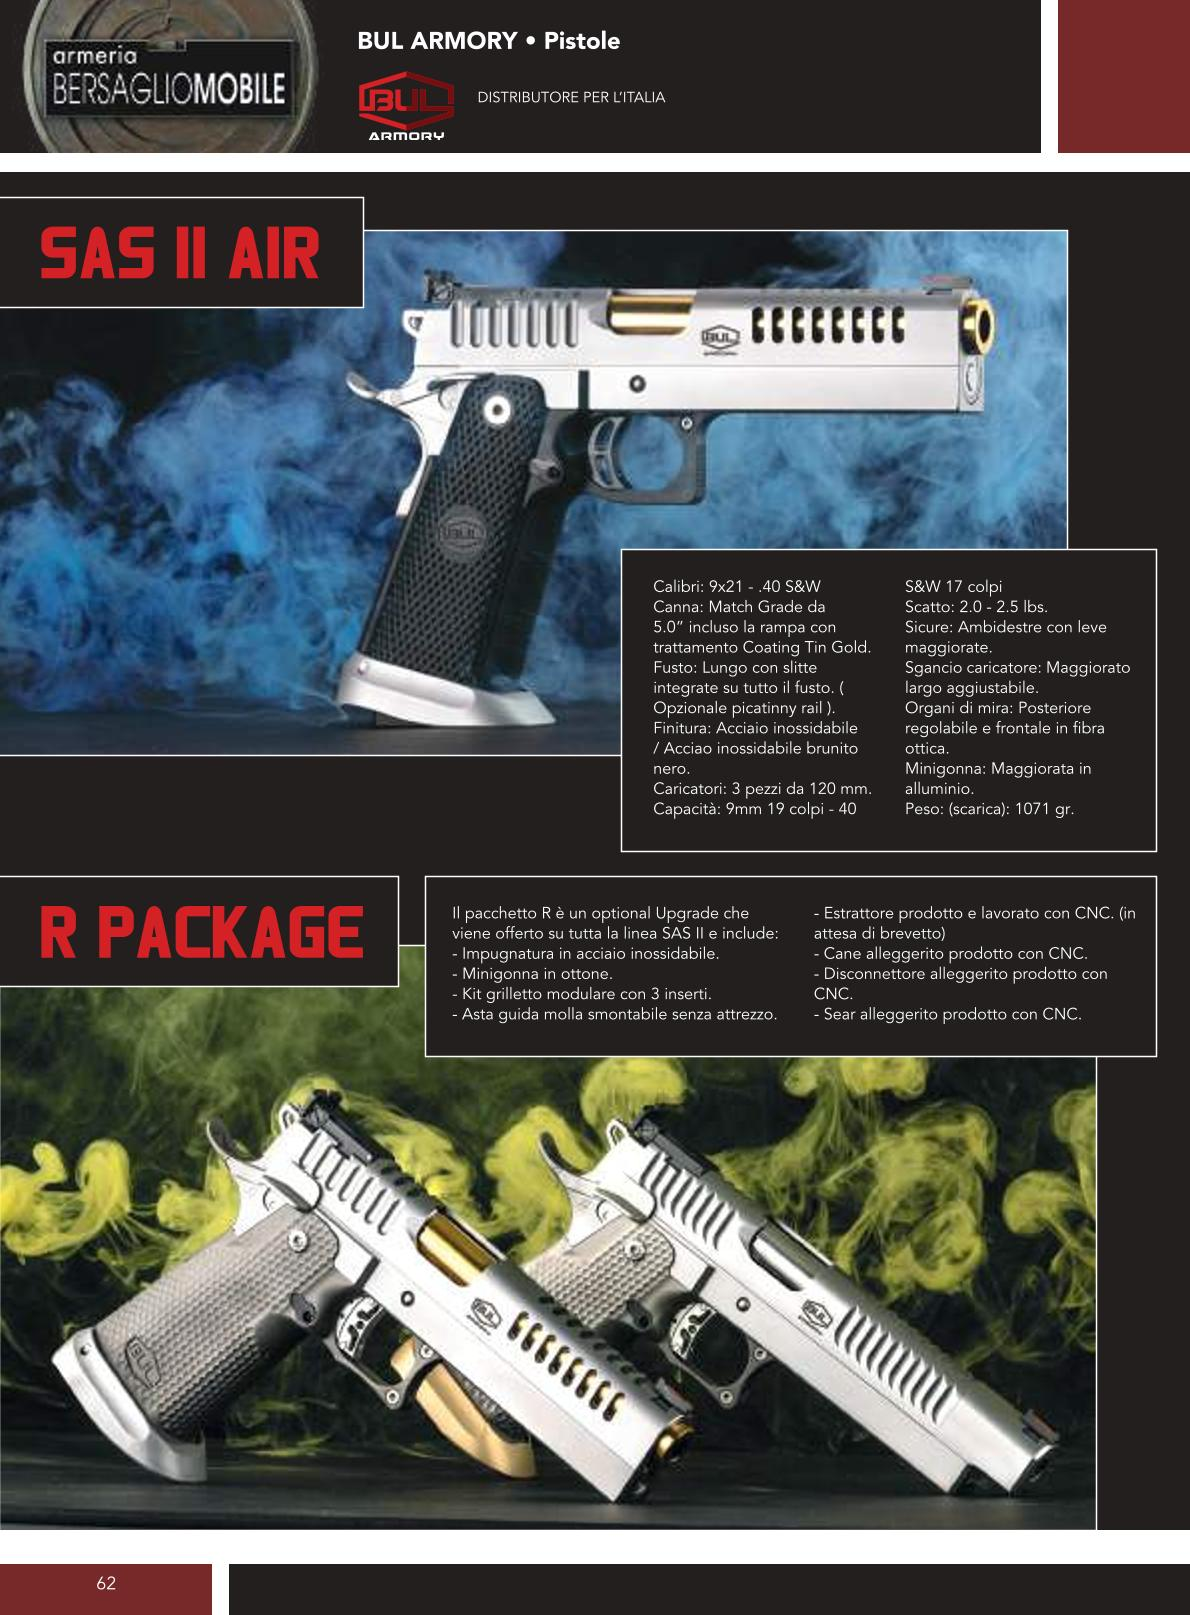 Bul Armory - Sas II Air - R Package - Armeria Bersaglio Mobile